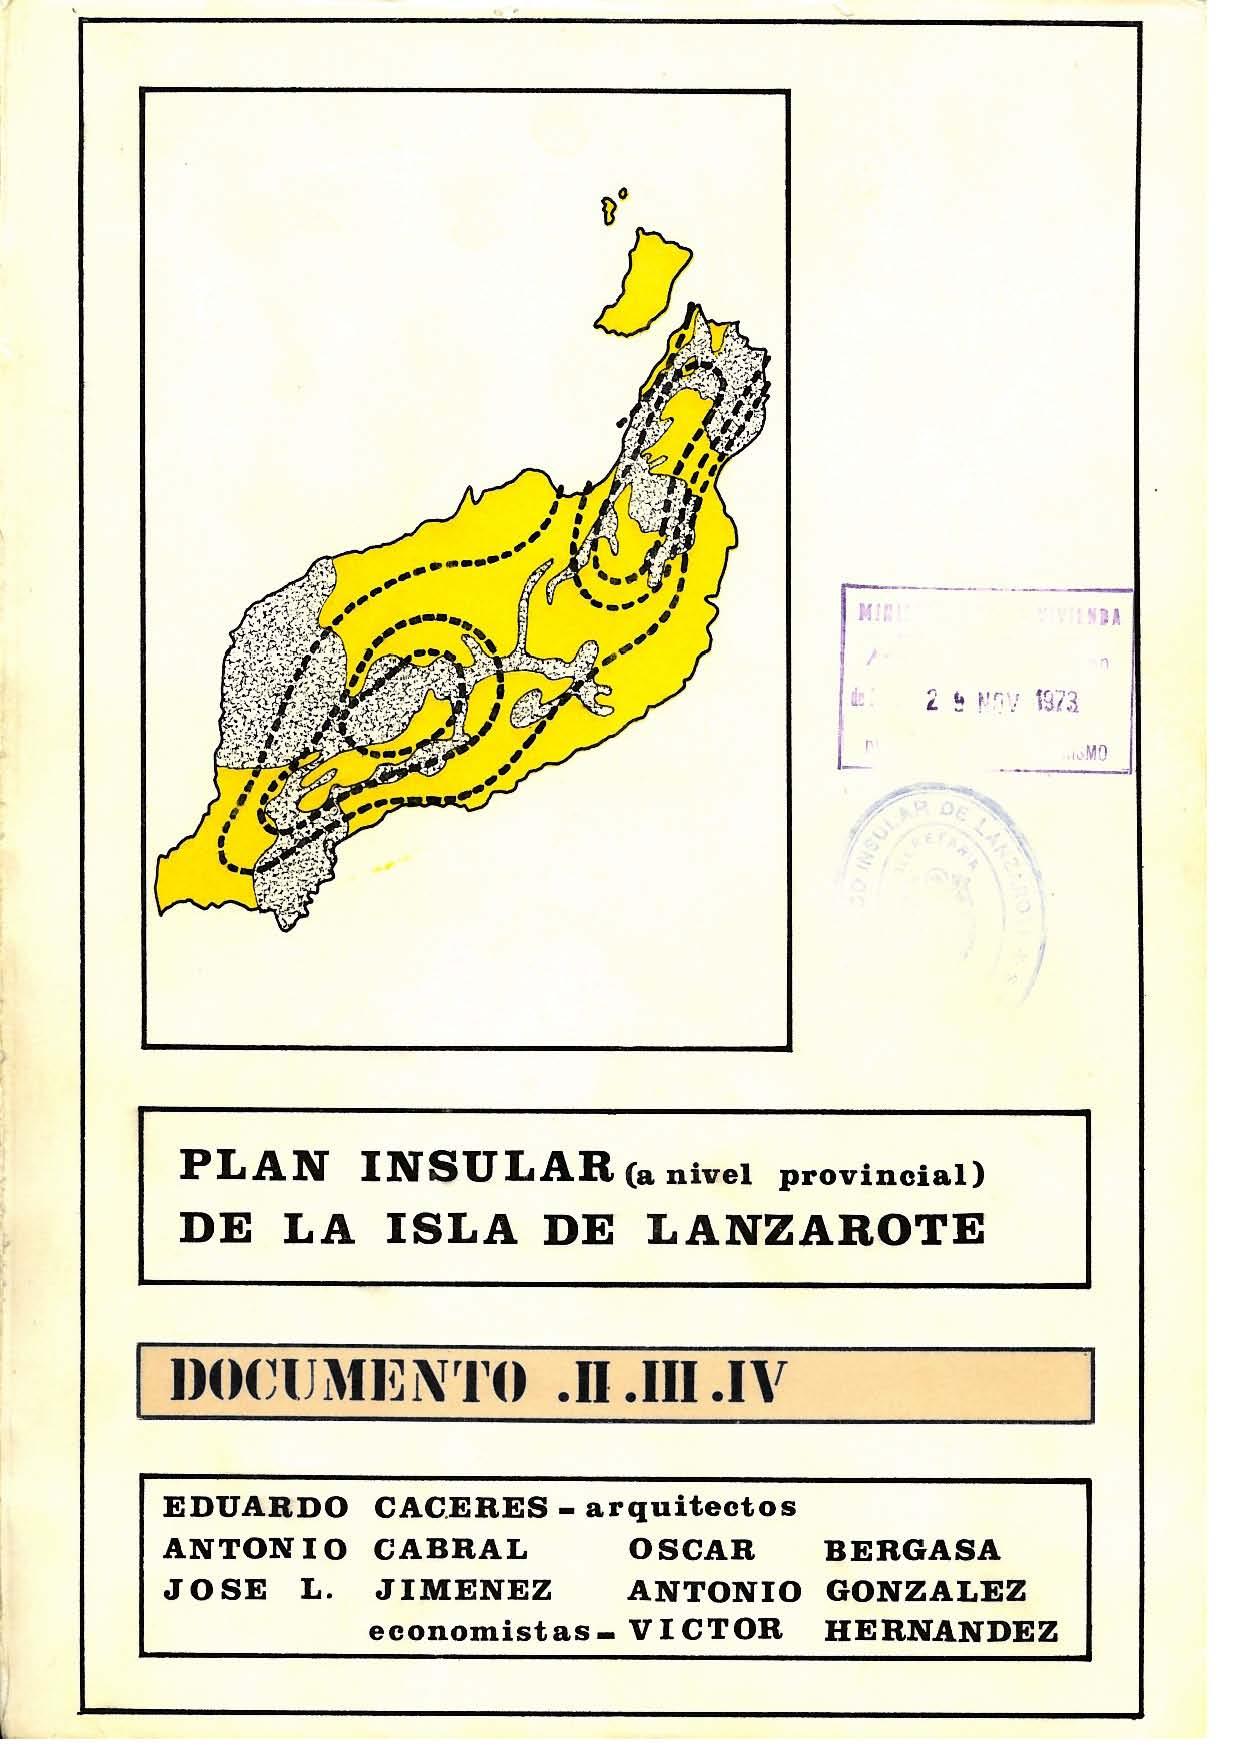 Documento II (Plan de 1973): Memoria